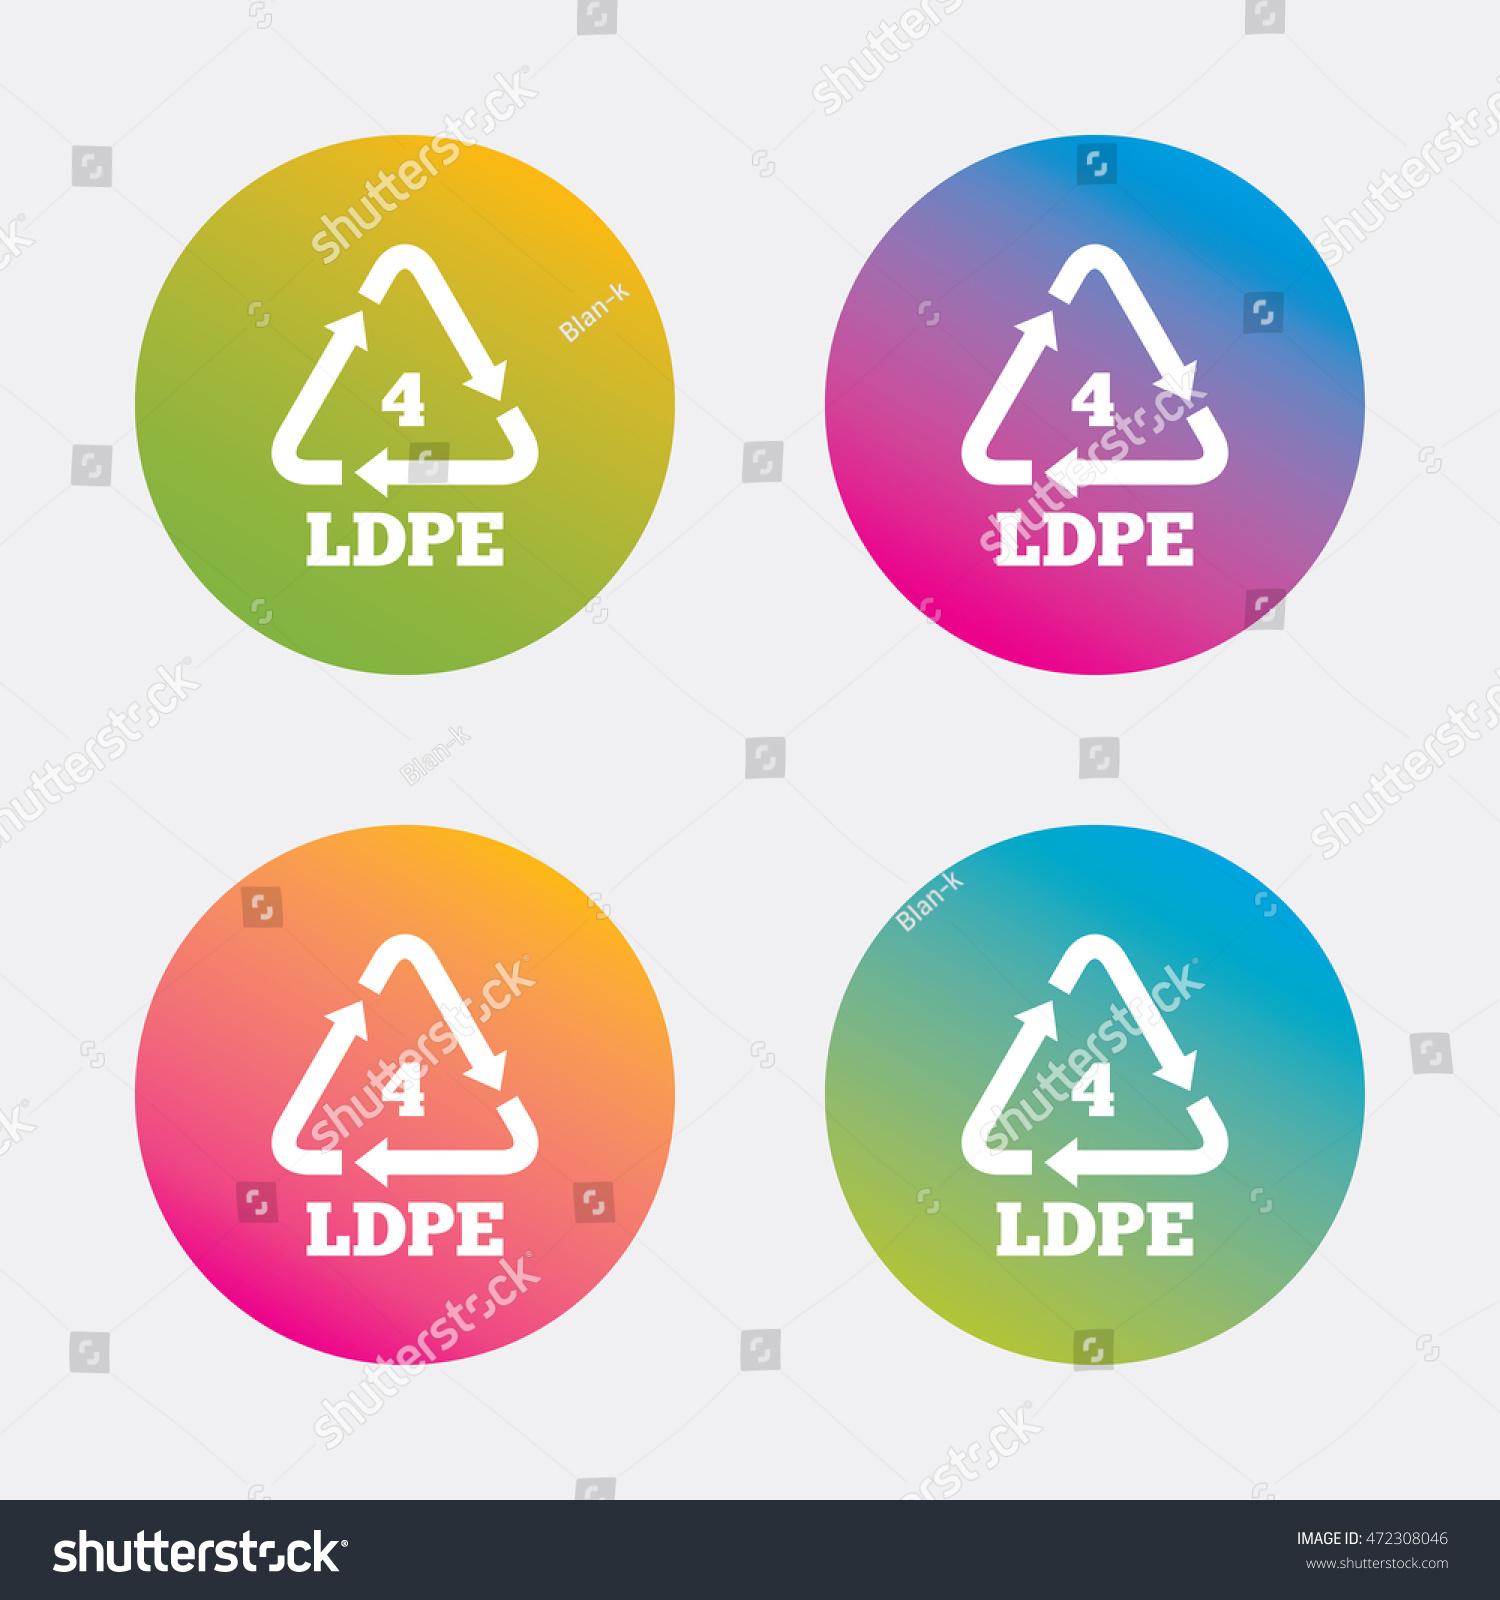 Ldpe 4 icon lowdensity polyethylene sign stock vector 472308046 ld pe 4 icon low density polyethylene sign recycling symbol gradient biocorpaavc Choice Image